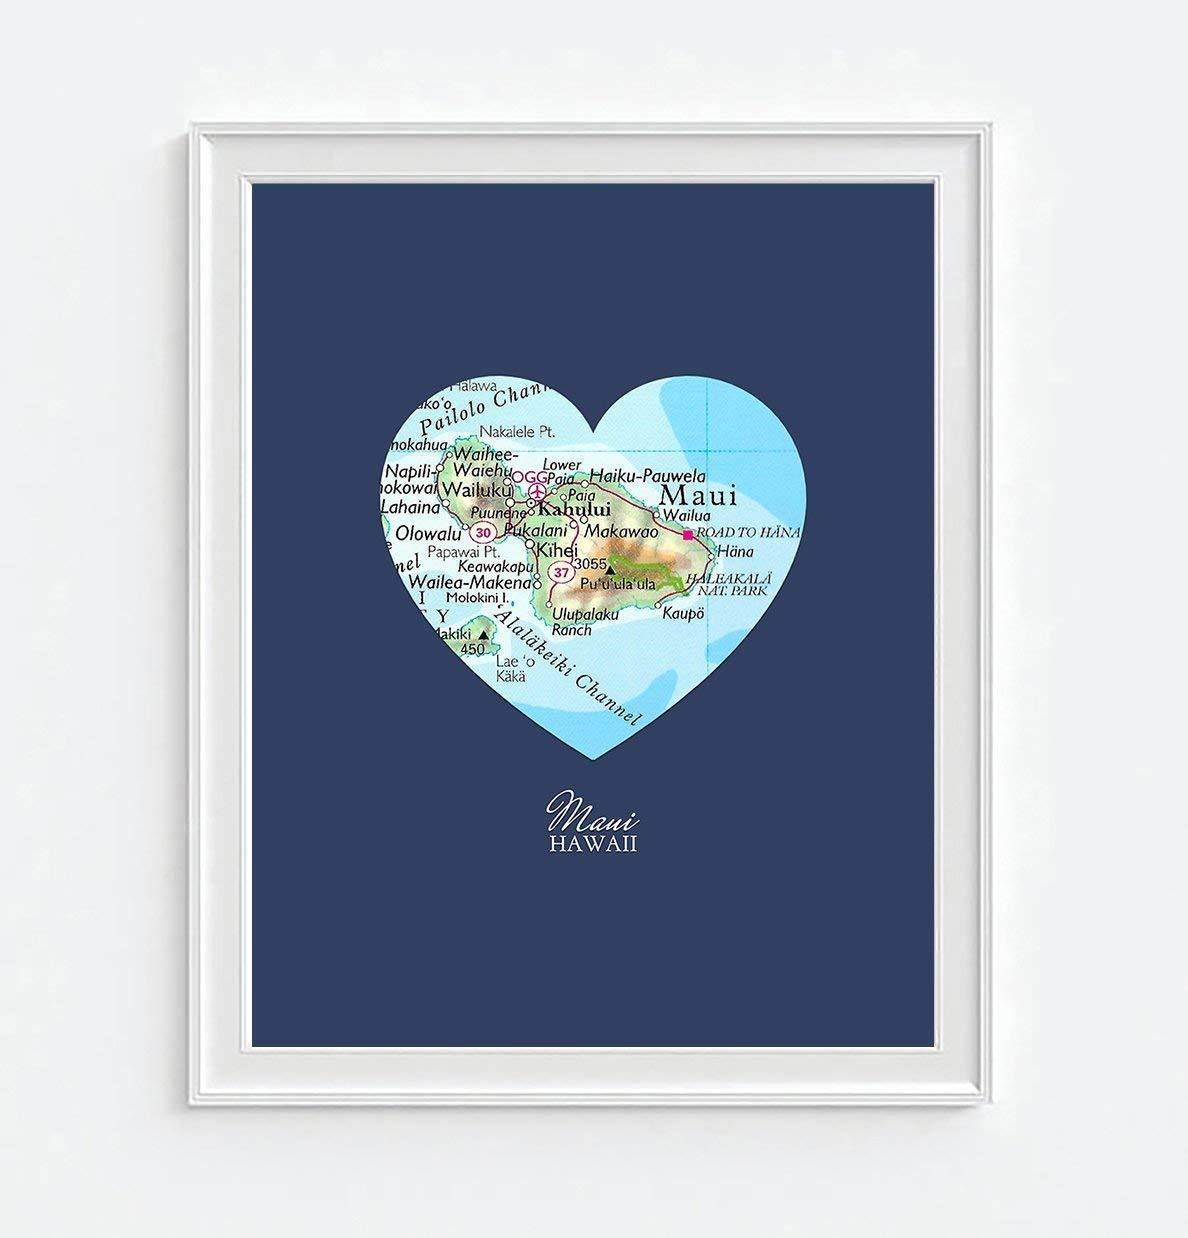 Maui Hawaii Vintage Heart Map Art Print, Unframed, Customized Colors, Wedding Engagement Anniversary Housewarming Gift, All Sizes